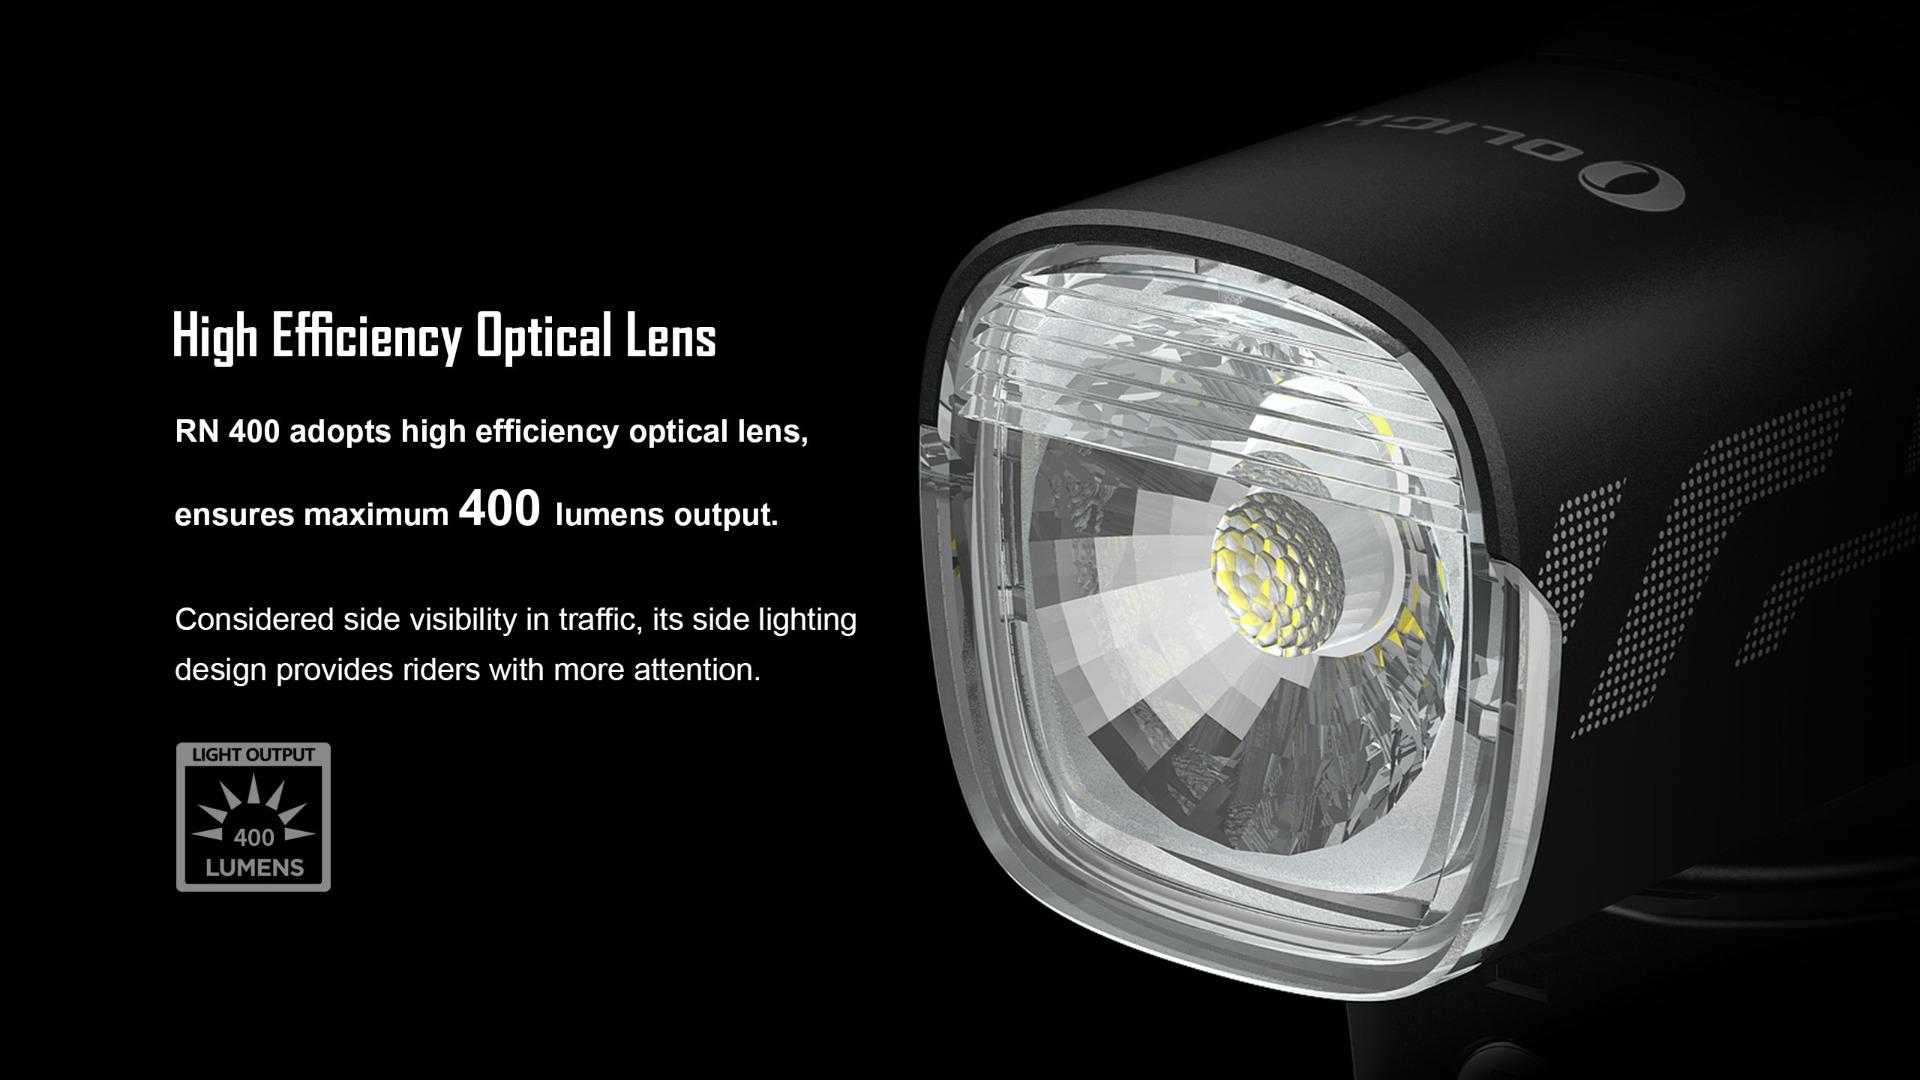 Olight RN 400 Bike LED Light Headlight High Efficiency